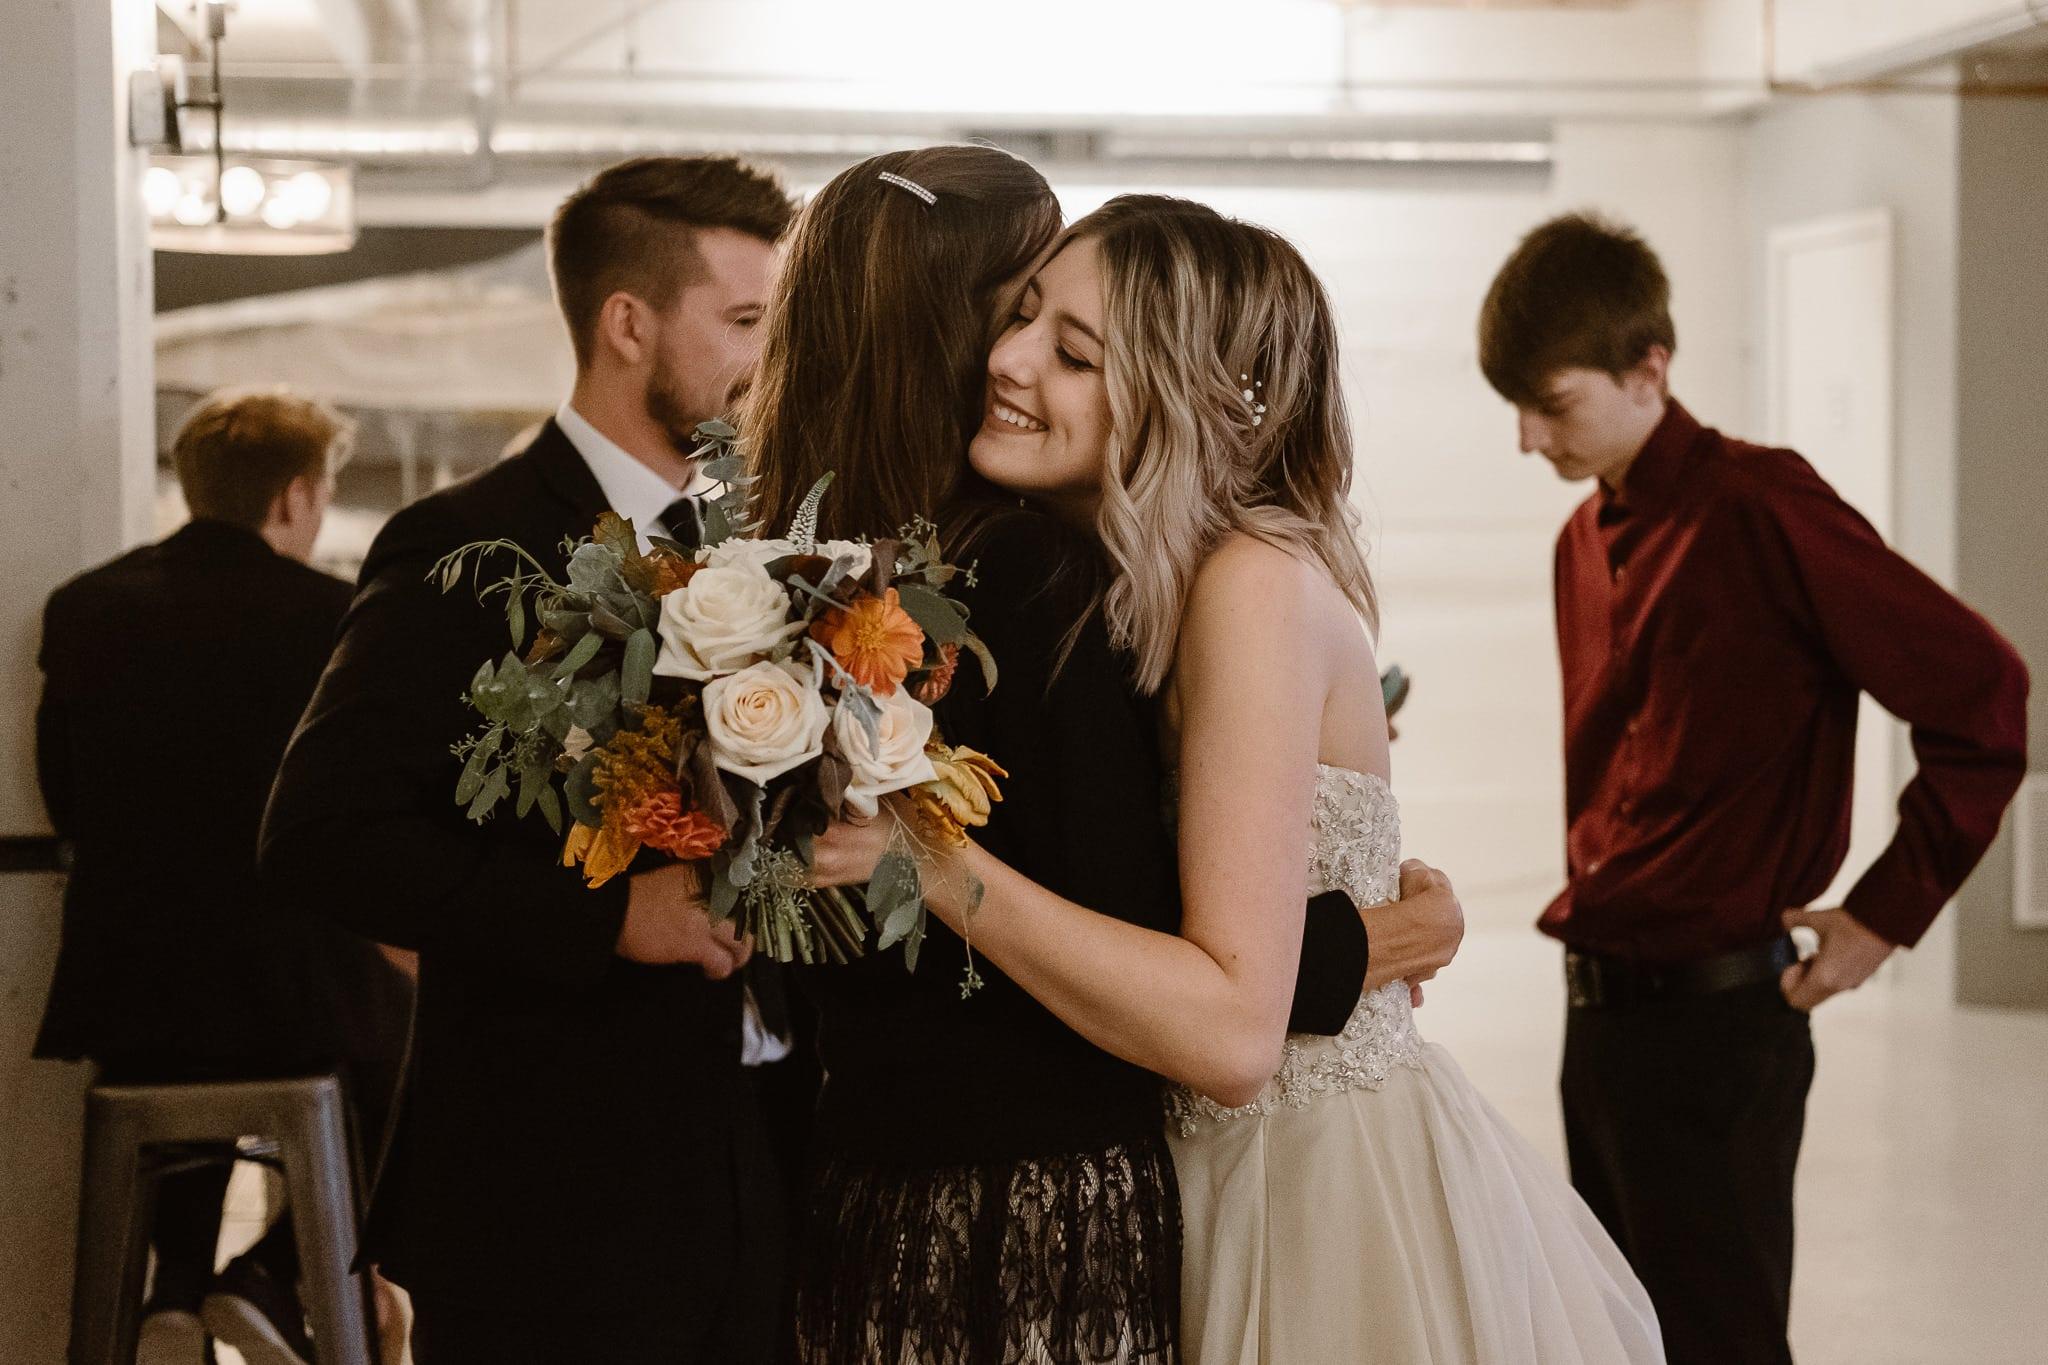 St Vrain Wedding Photographer | Longmont Wedding Photographer | Colorado Winter Wedding Photographer, Colorado industrial chic wedding ceremony, cocktail hour photos